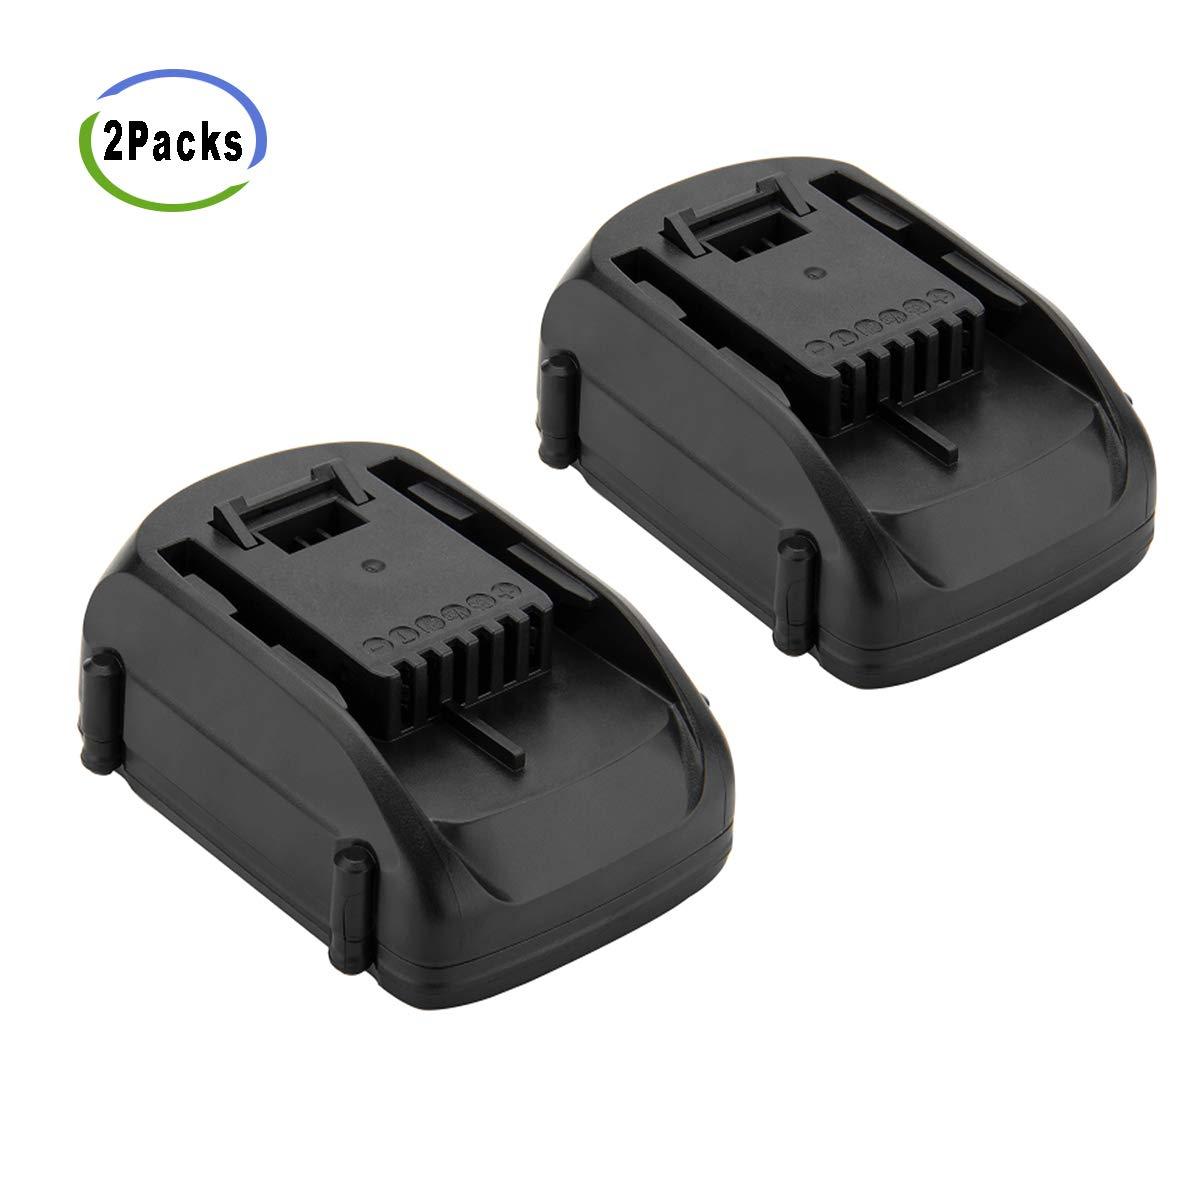 2Packs Creabest 18V-20V 2500mAh Li-ion Repalcement Battery for Worx Replacement Battery WA3512 WA3512.1 WA3512 WA3511 WX163, Also Compatible with 20V Worx WA3520 WA3525 Li-ion Battery Pack